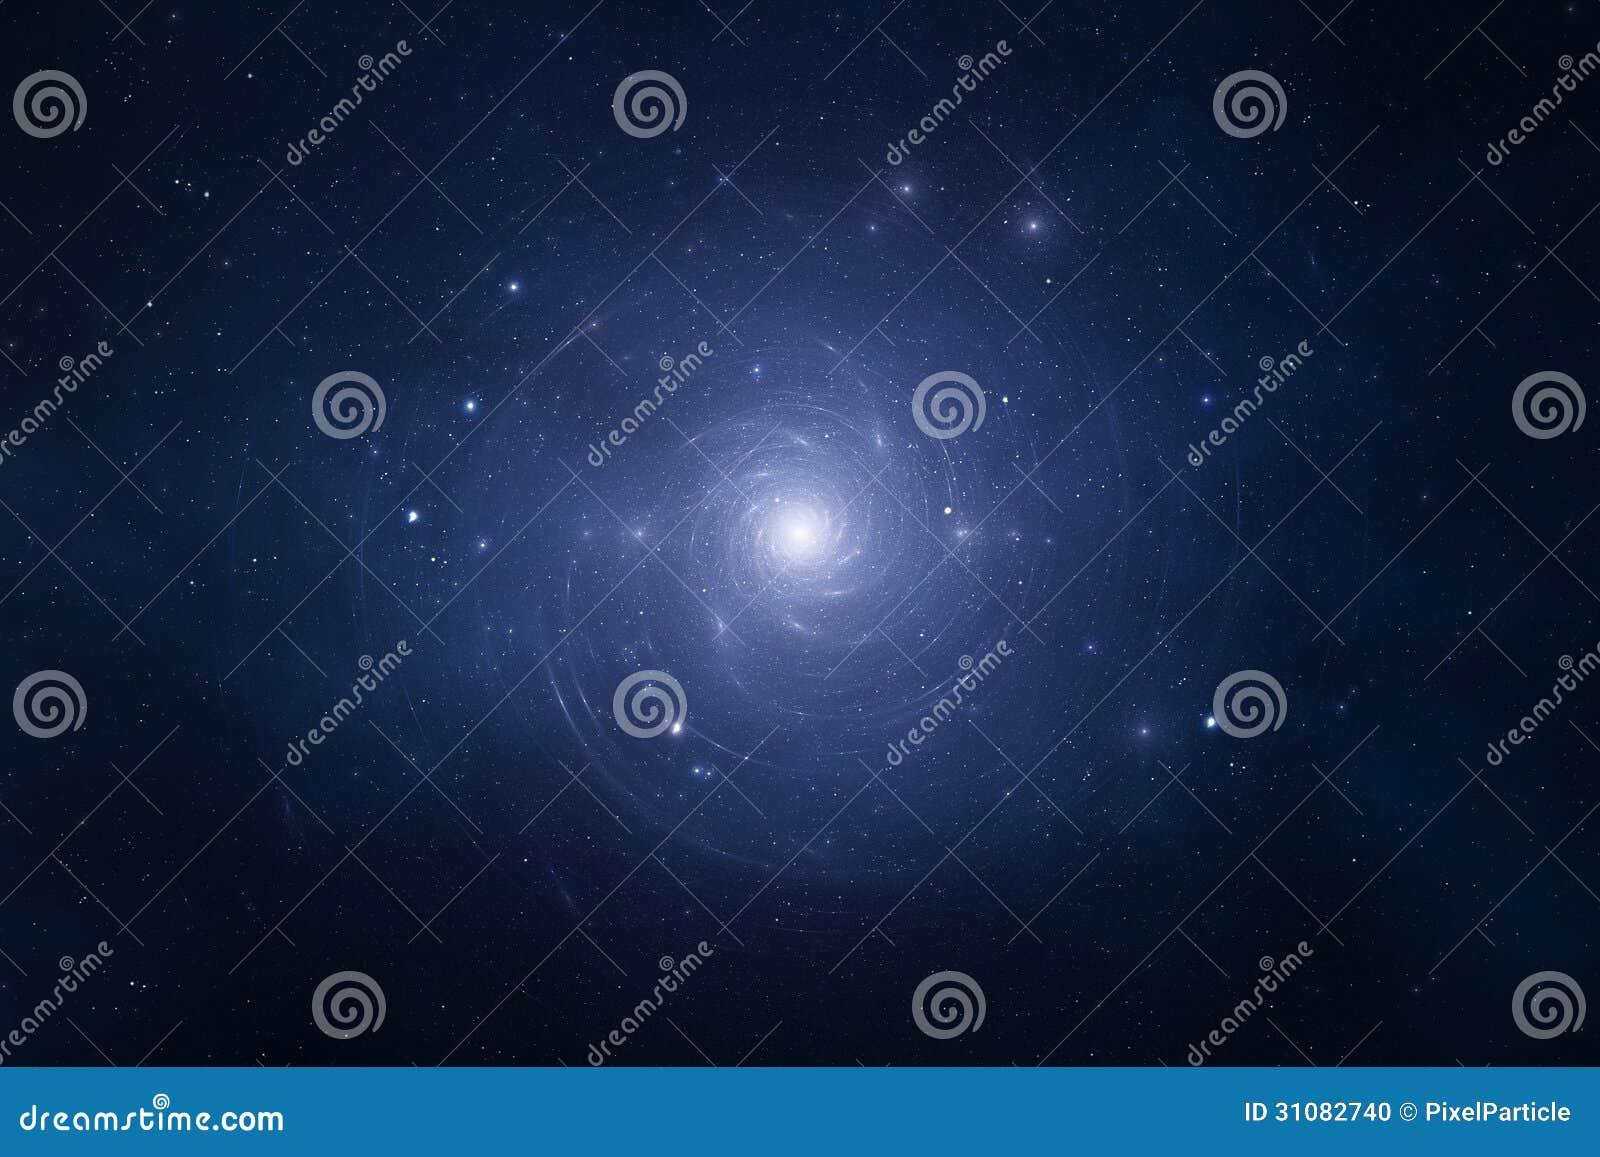 Spiral Galaxy Stock Photo - Image: 31082740